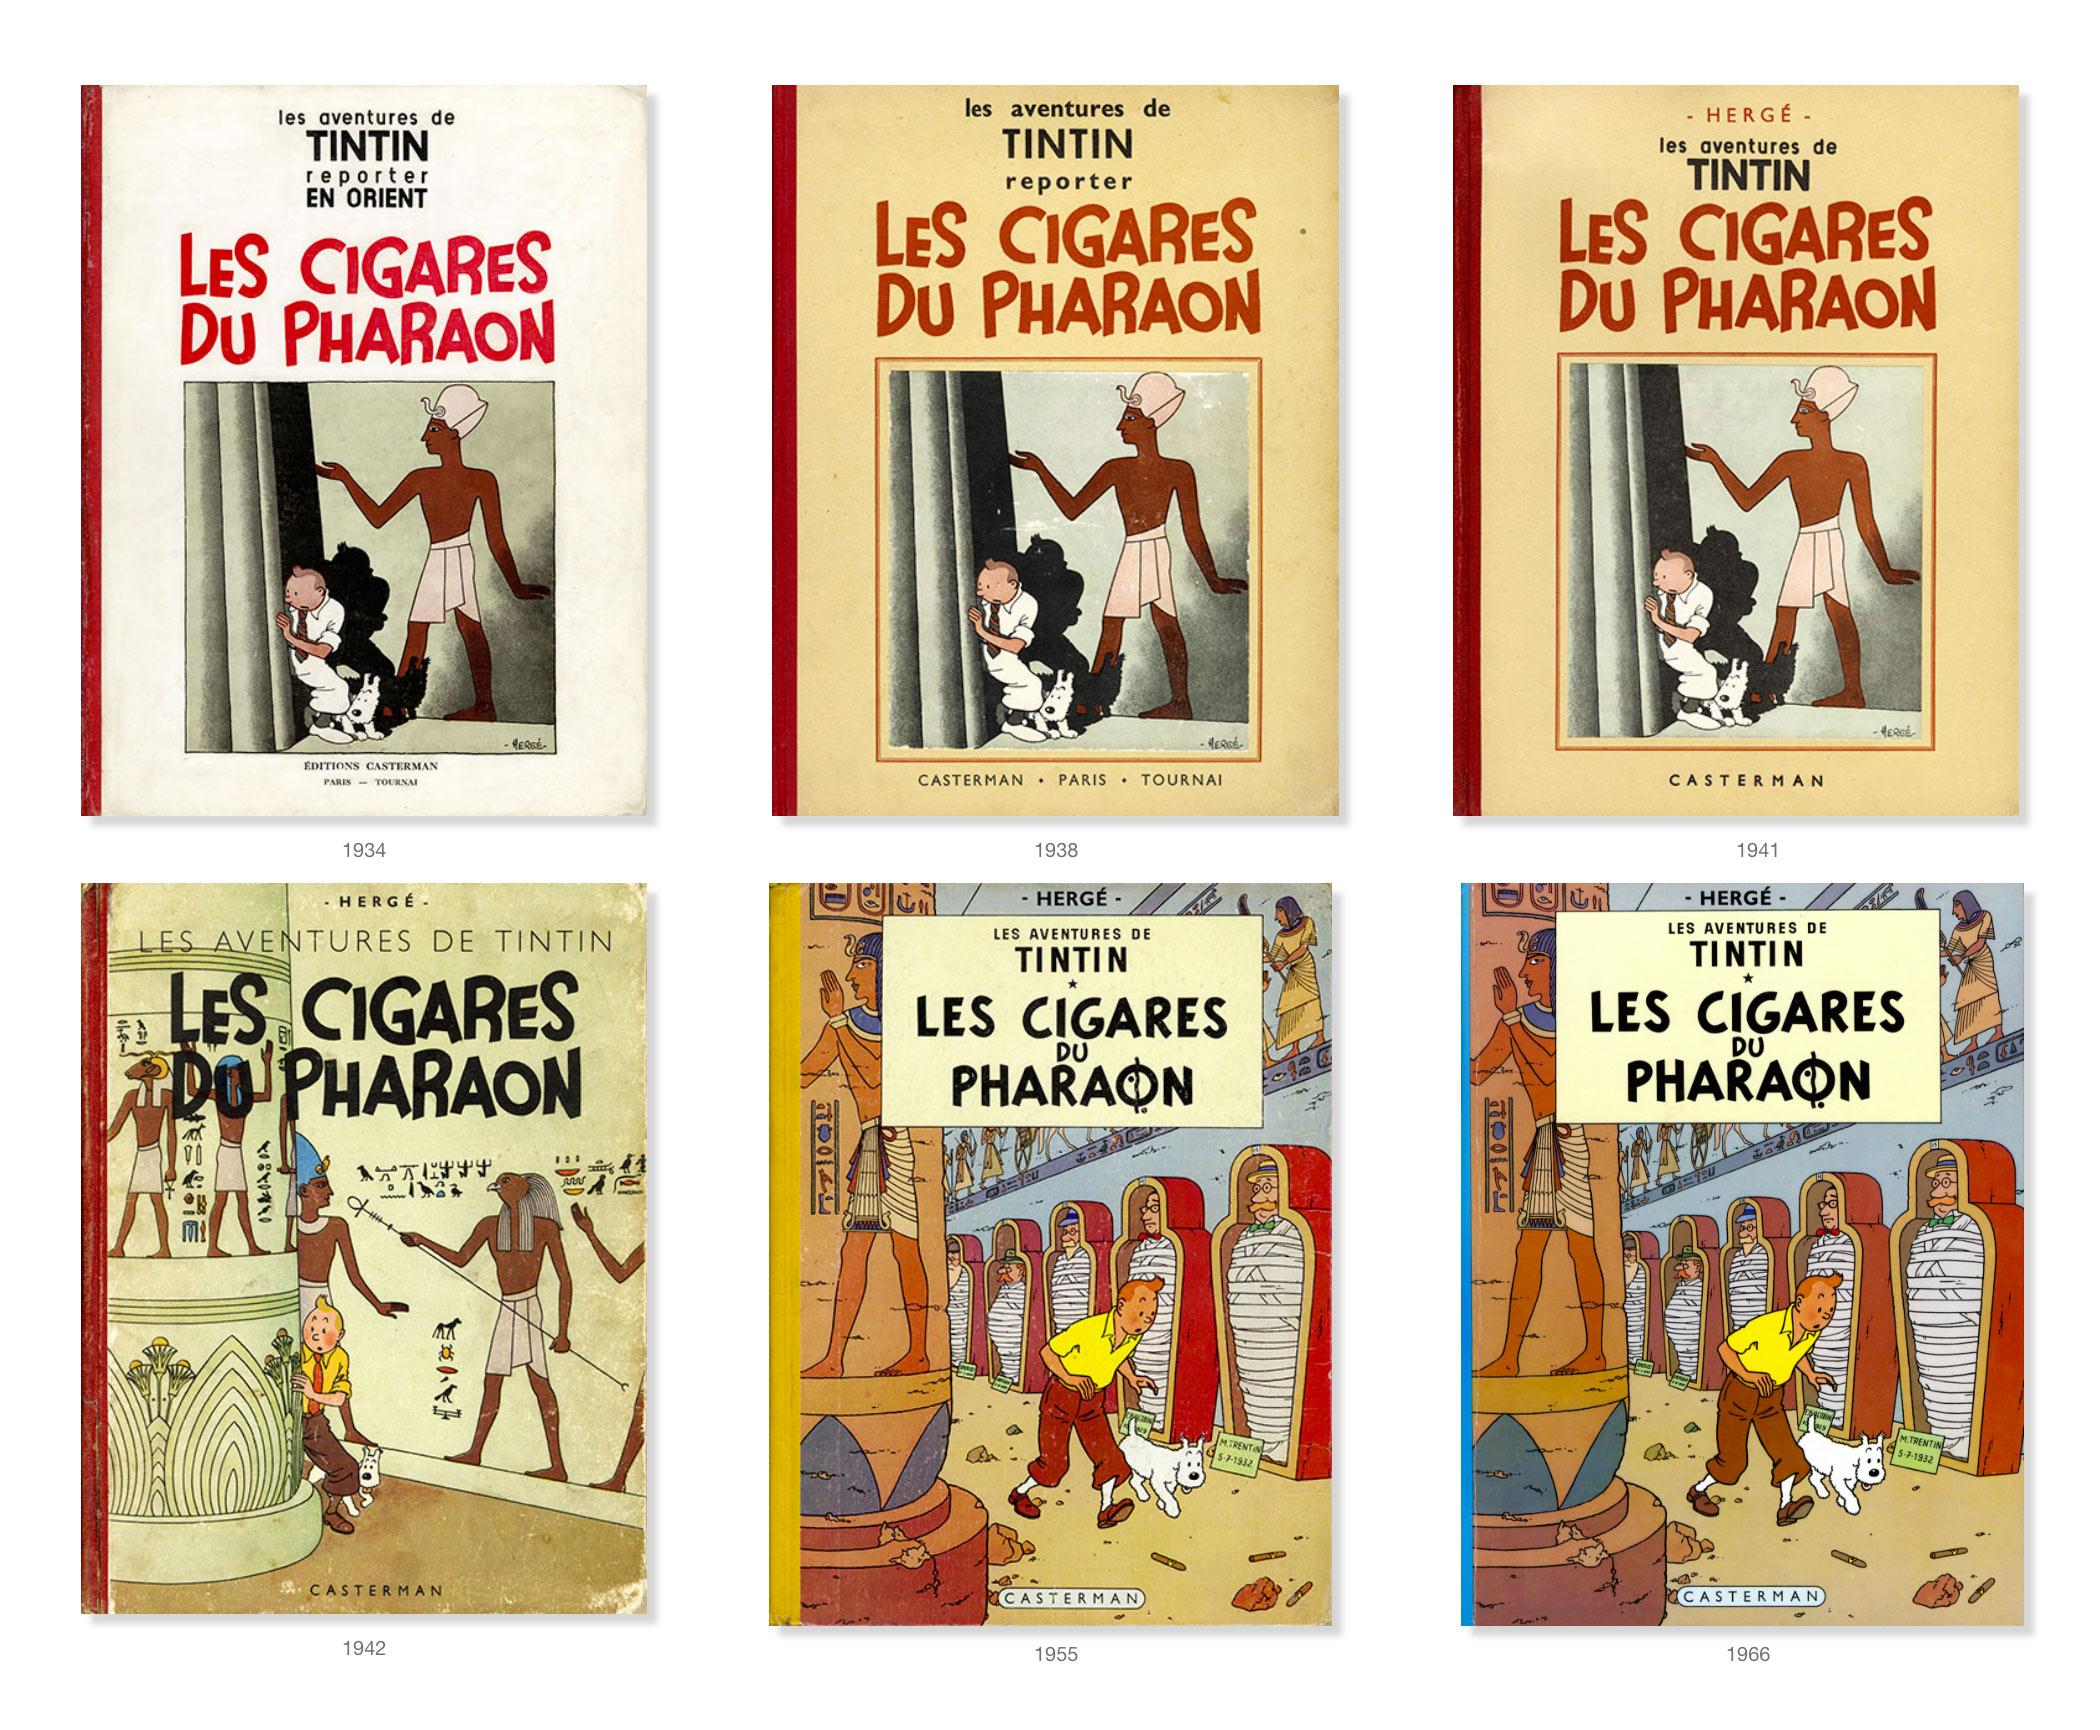 Tintin - Les Aventures de Tintin - Les Cigares du Pharaon - Couvertures Album